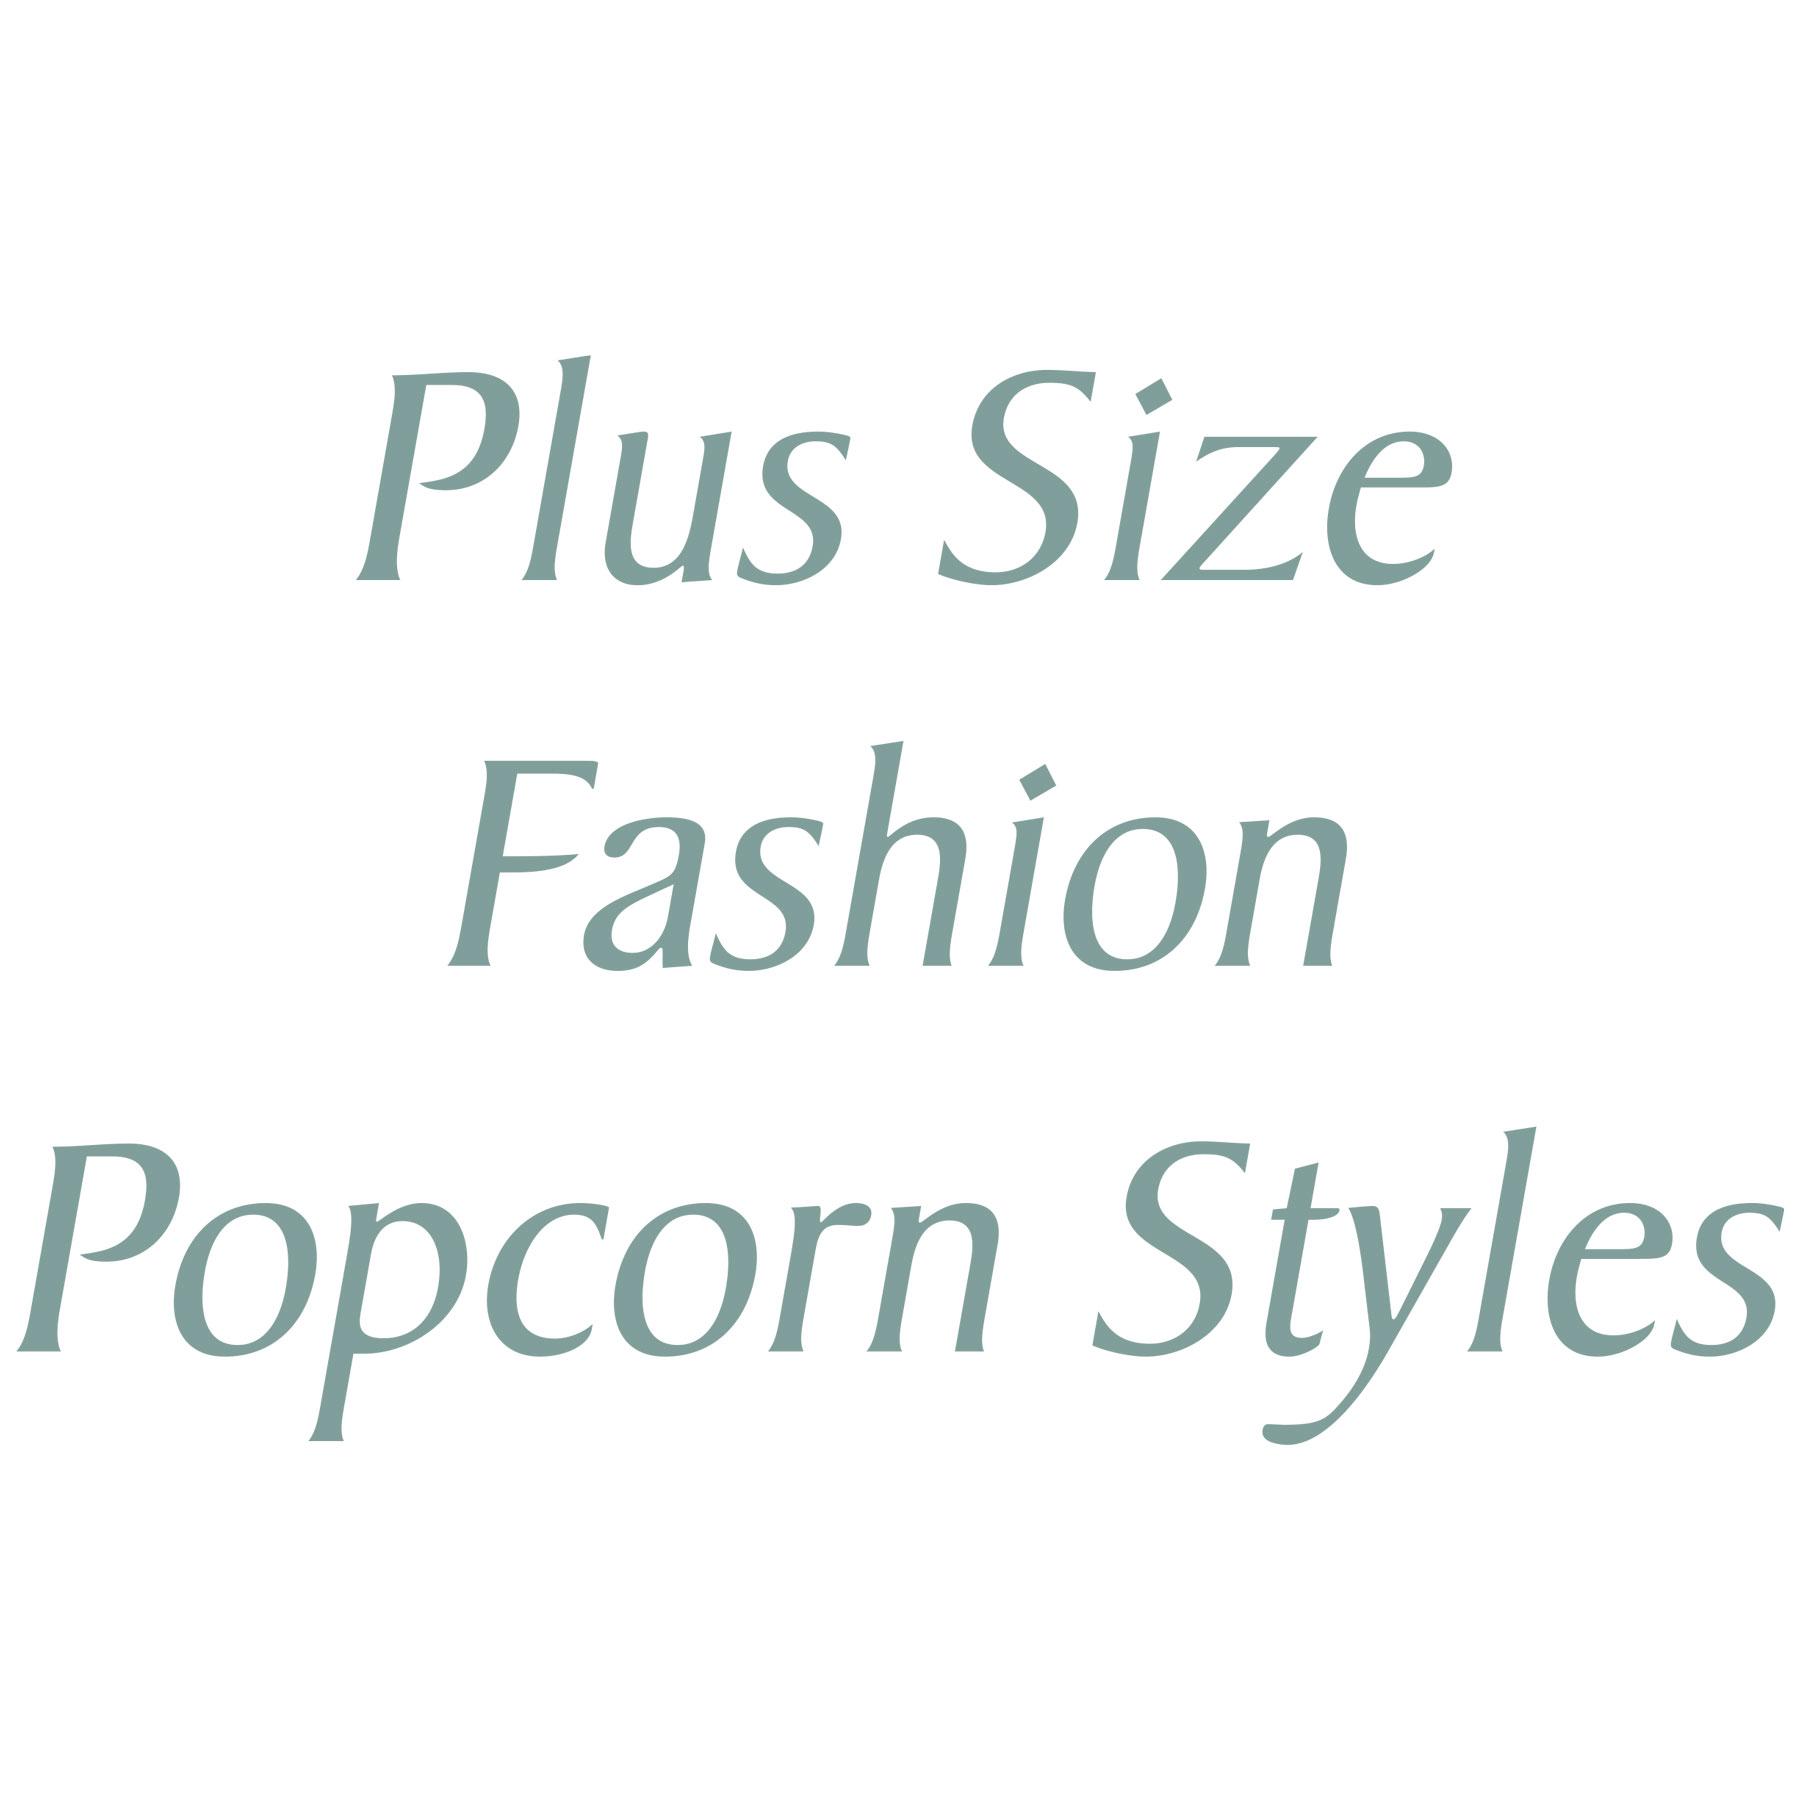 Popcorn Styles